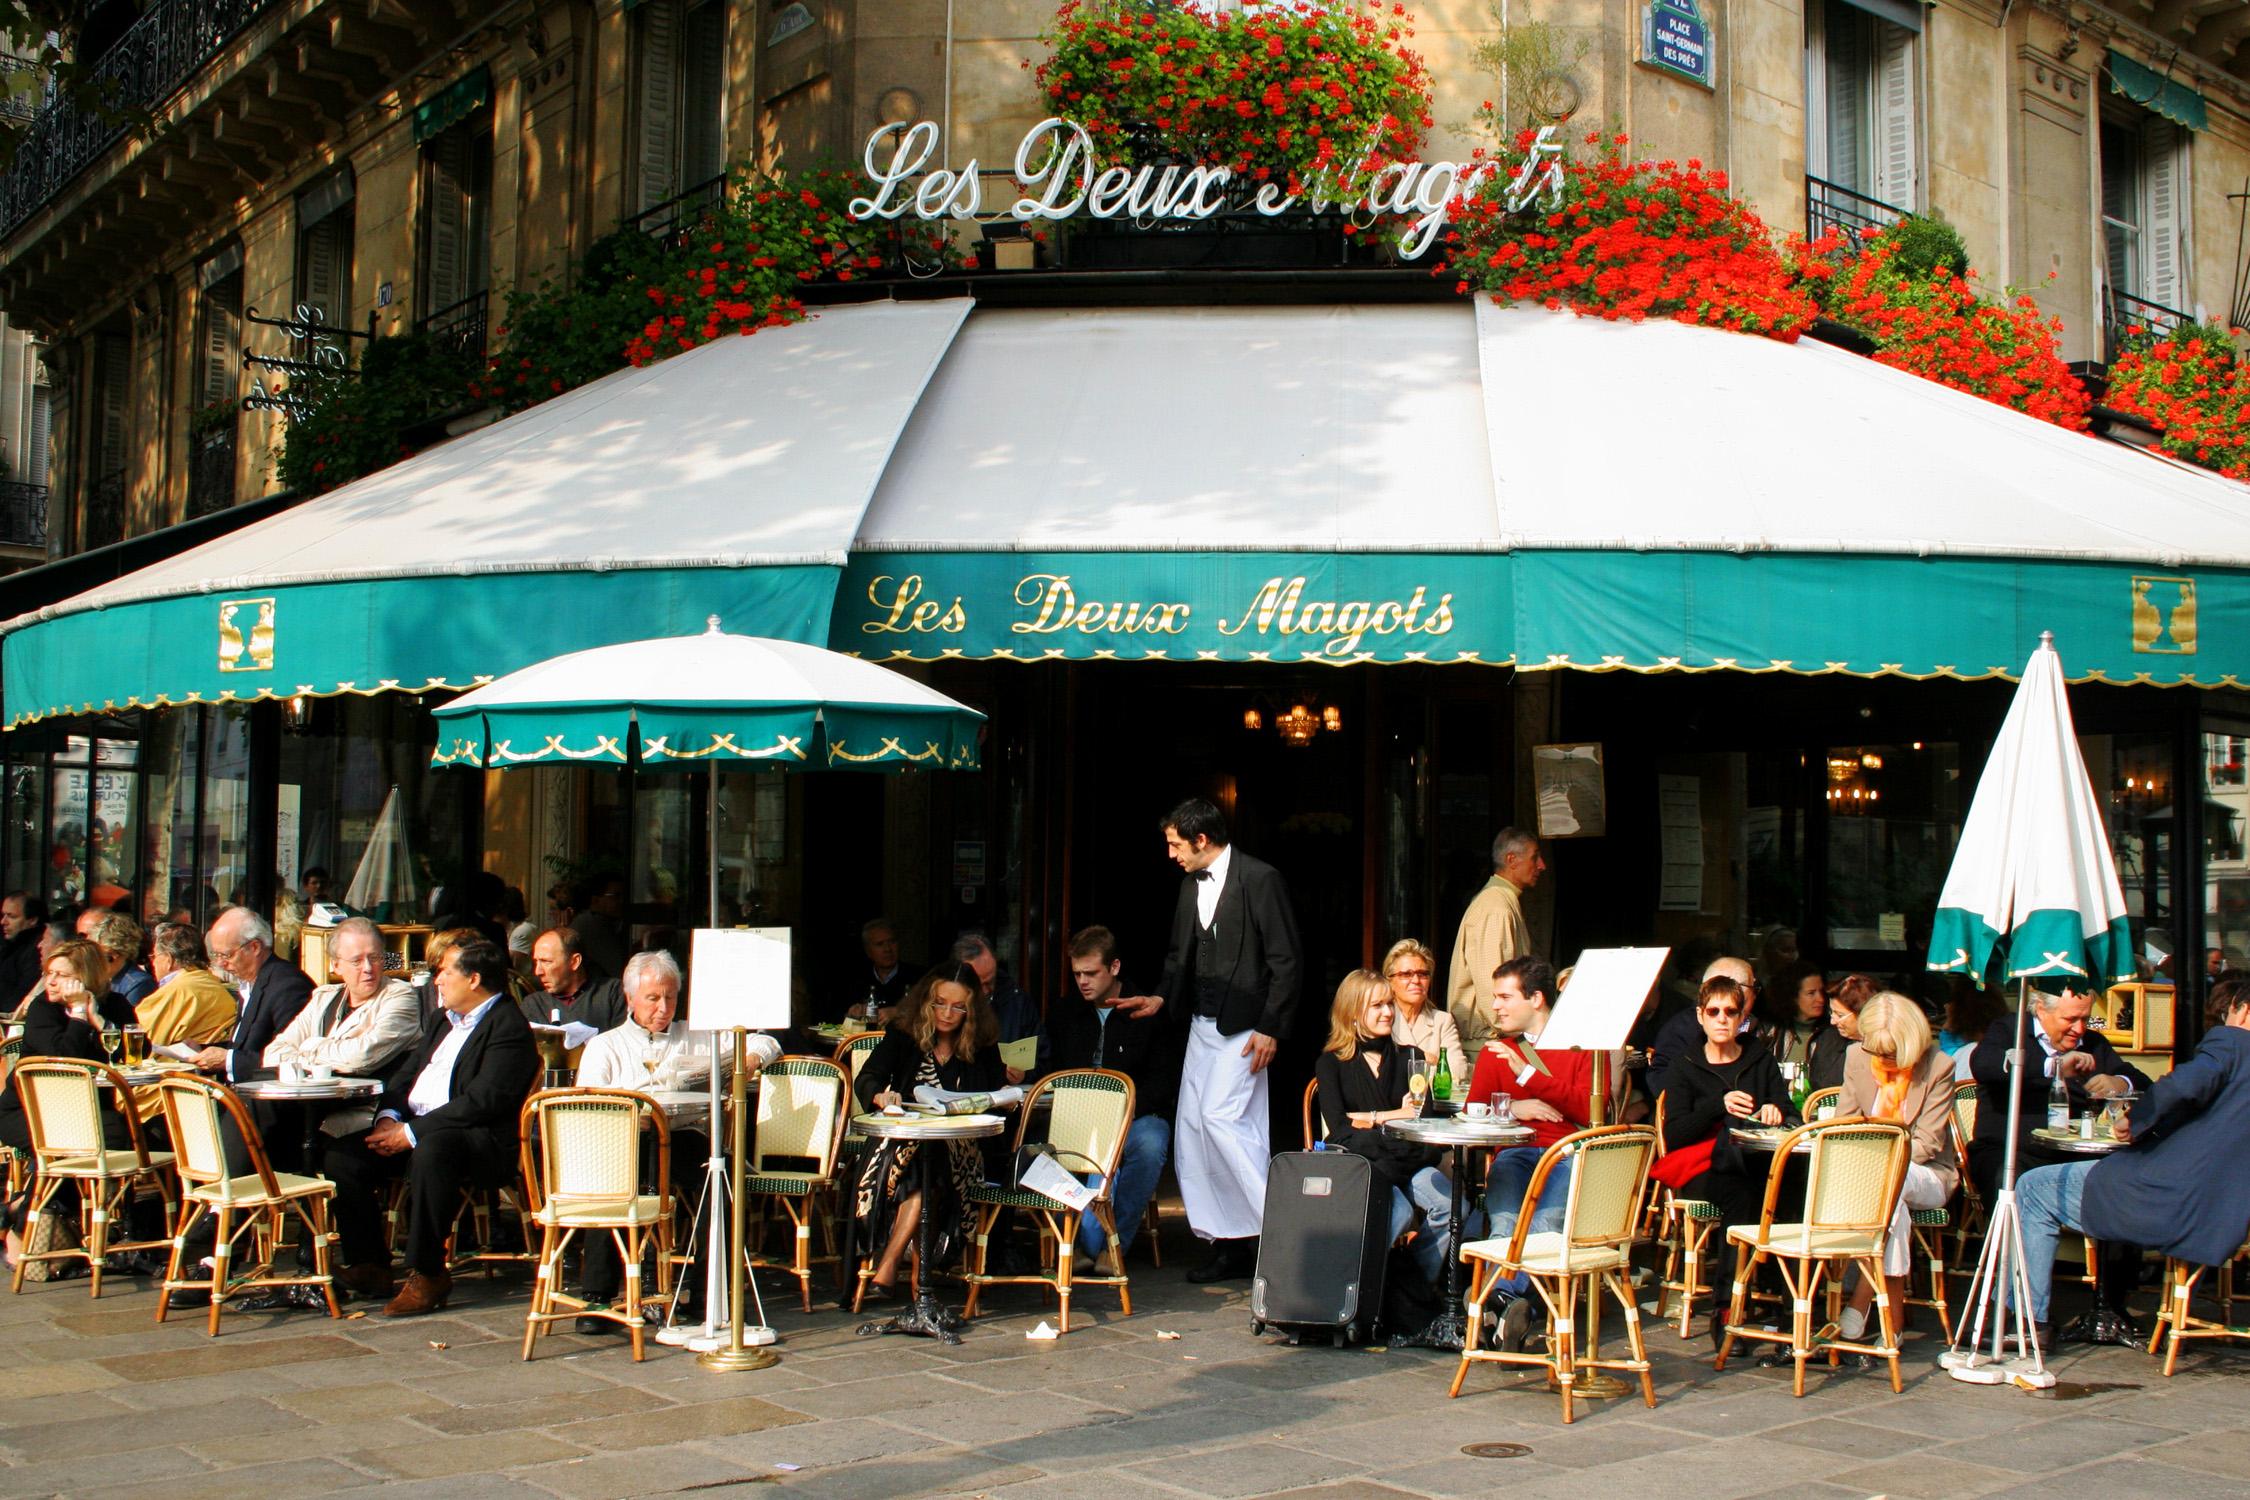 Paris  Les Deux Magots. Jon'skind of place for an afternoon.